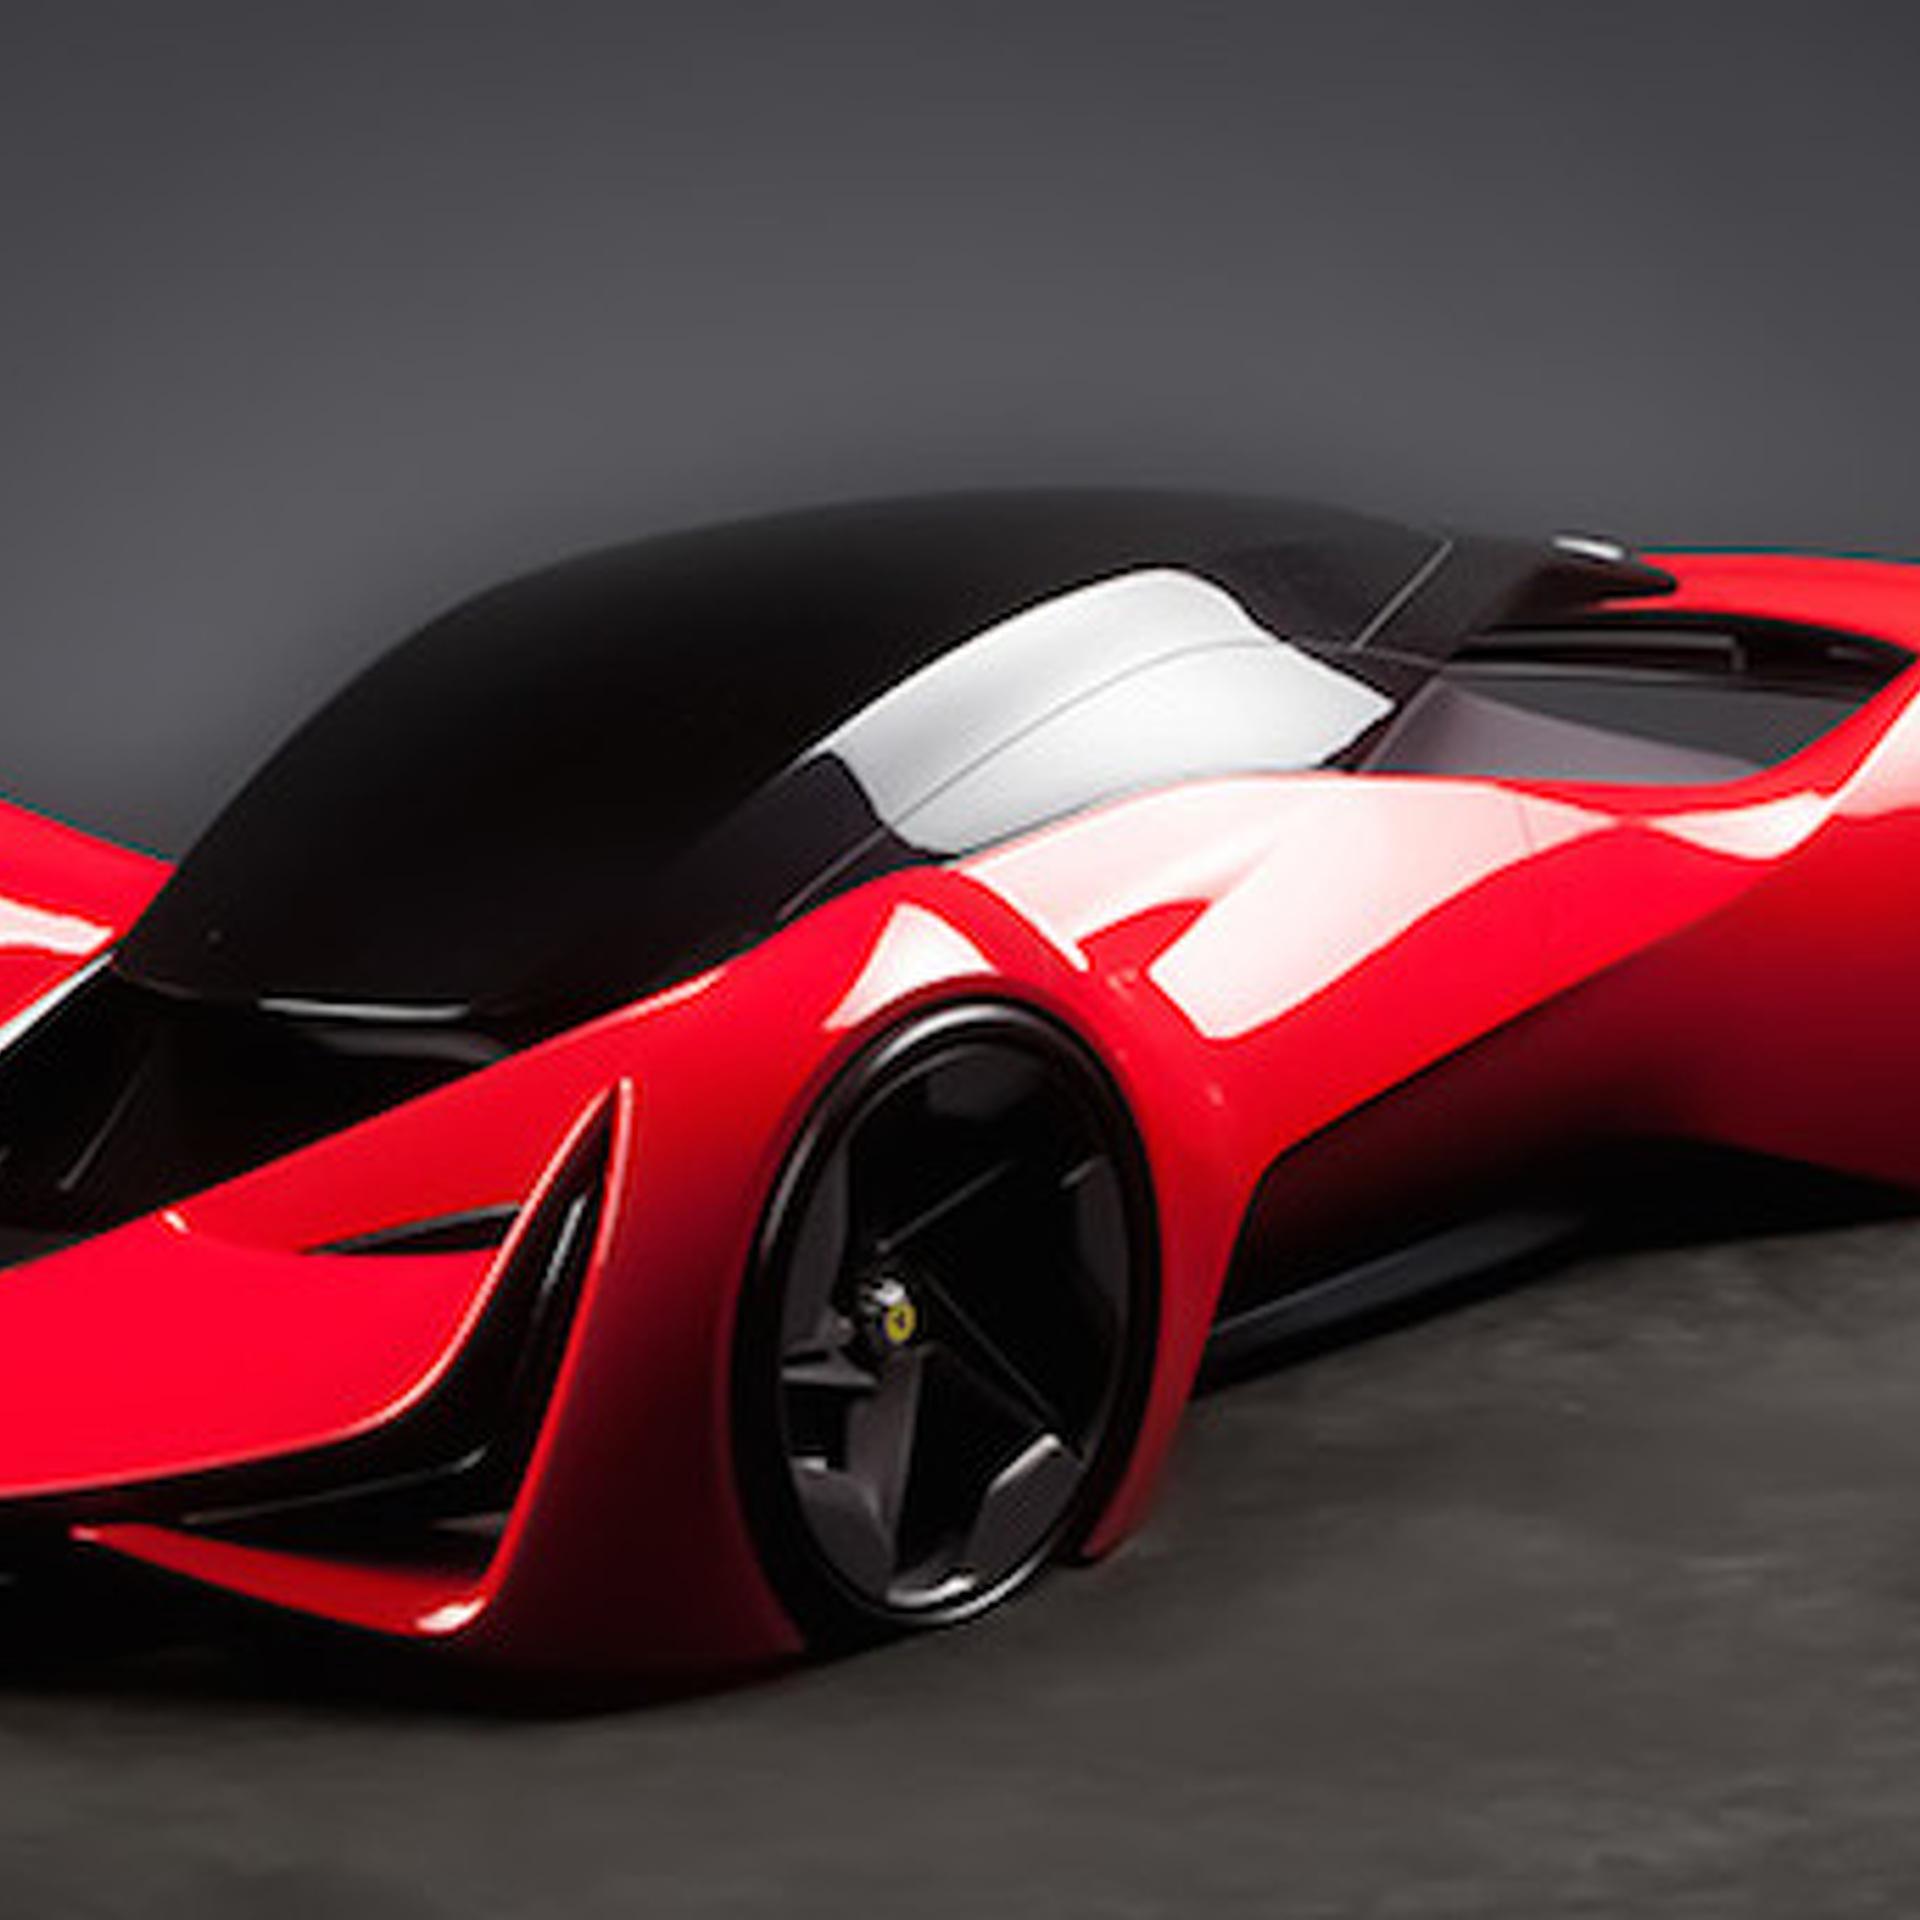 Ferrari concept cars